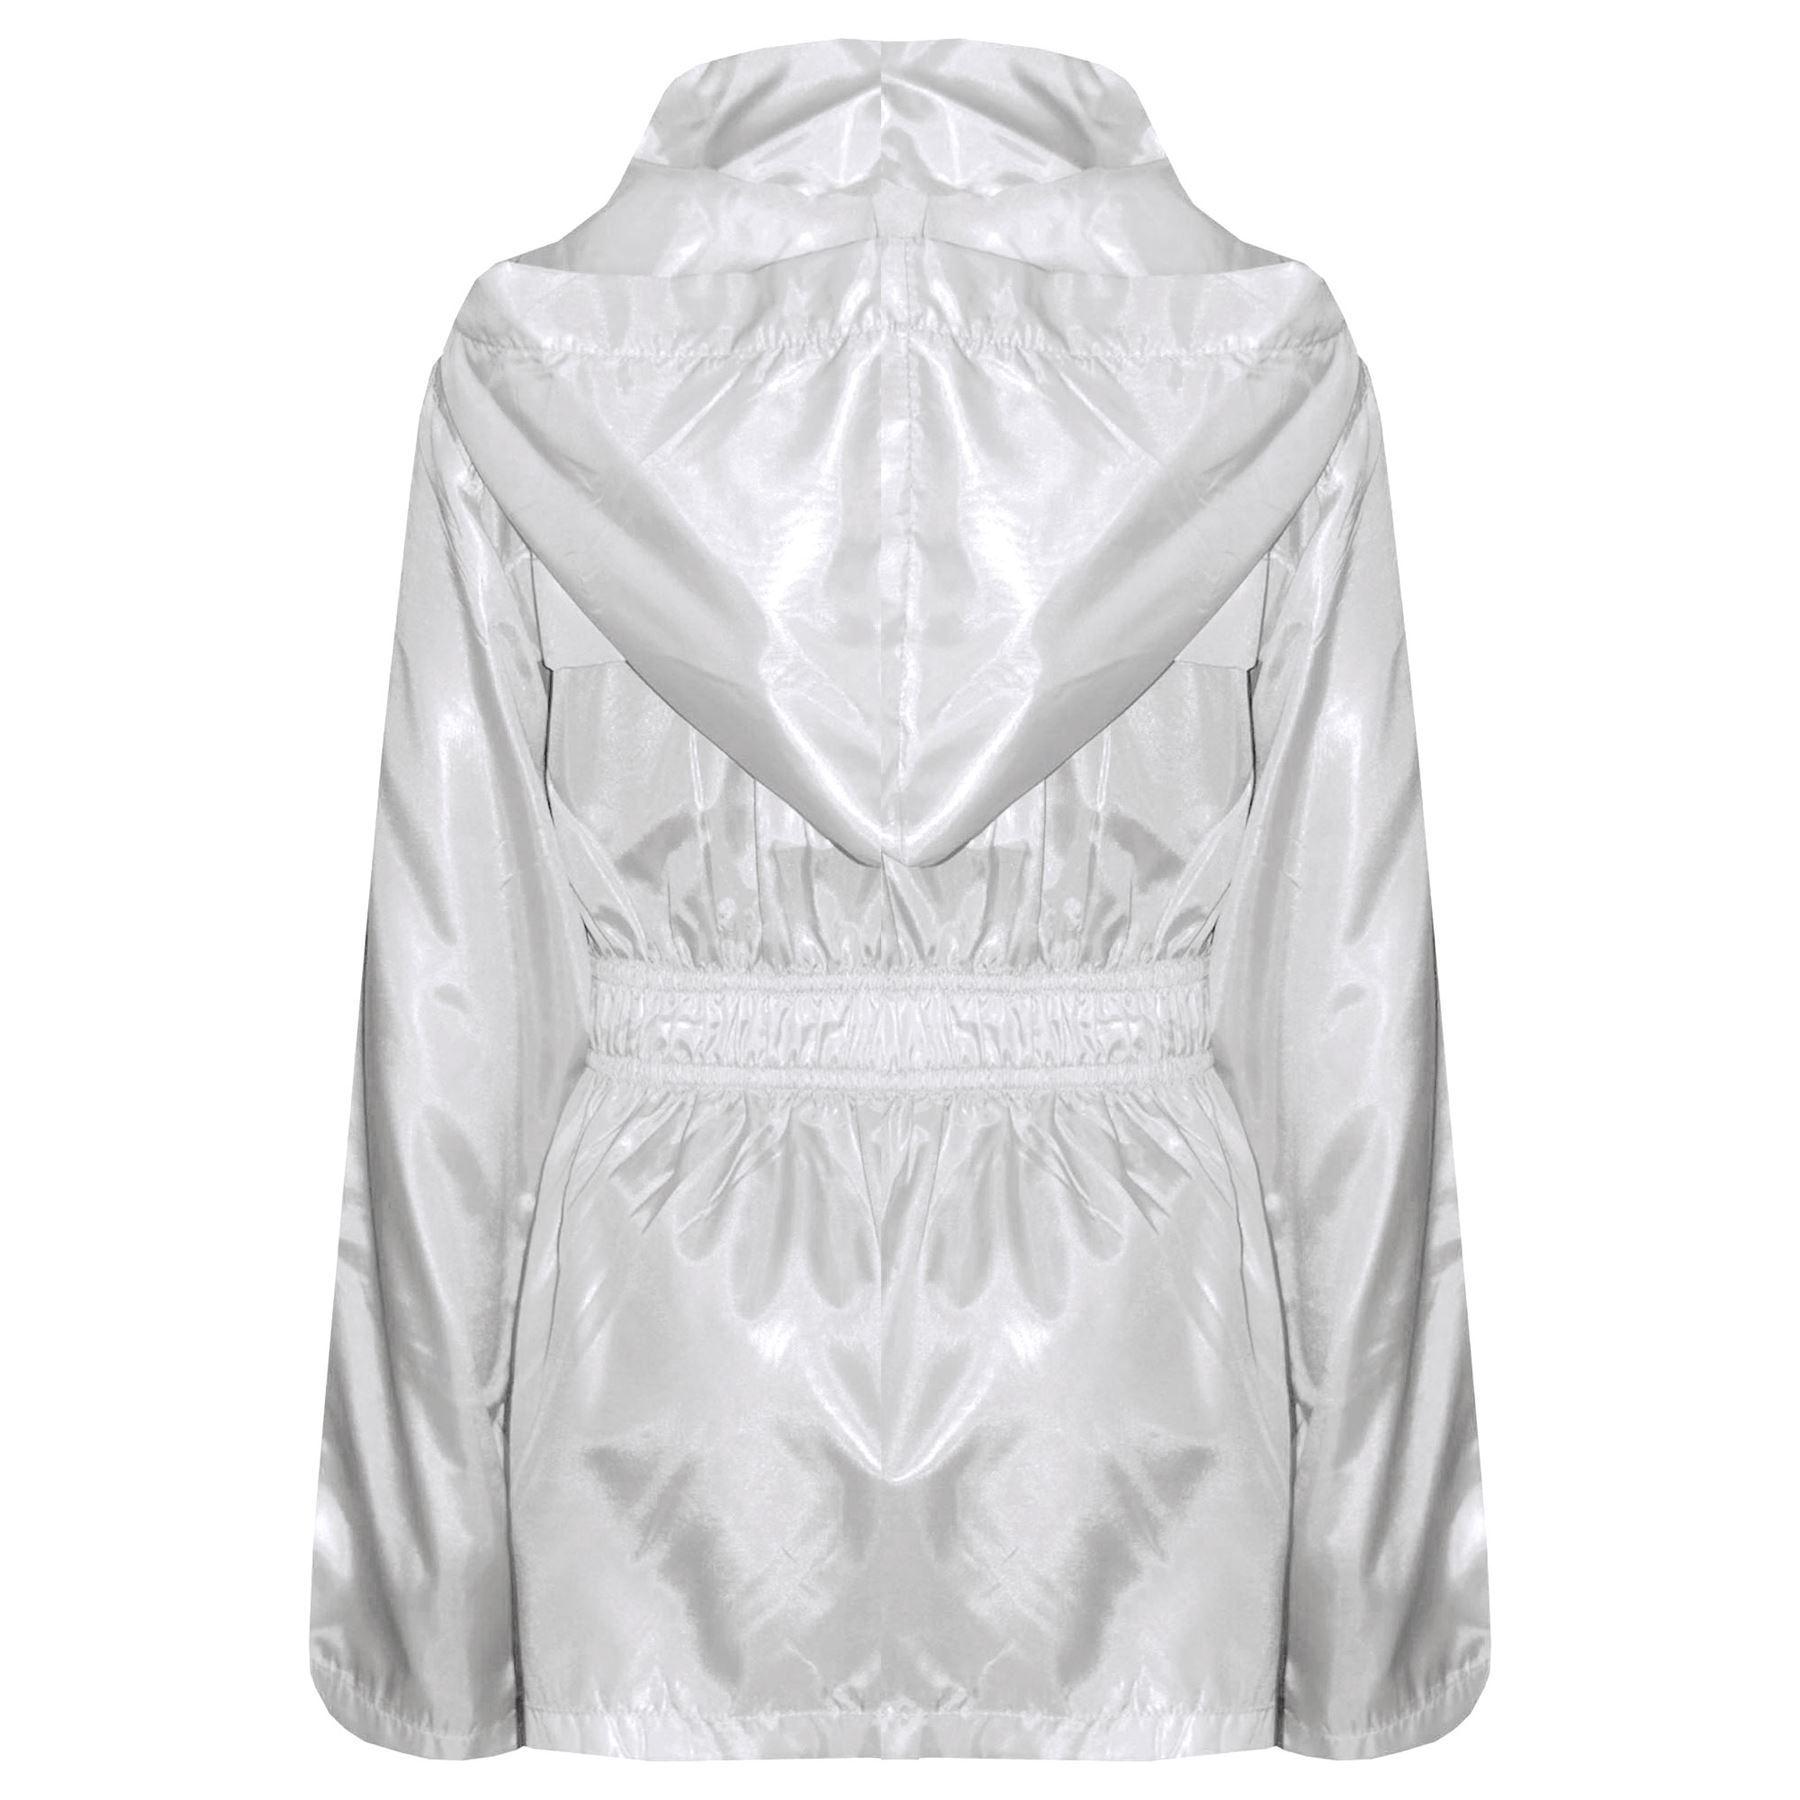 badfb7301e22 Girls Boys Raincoats Jackets Kids Lightweight Hooded Cagoule Rain ...